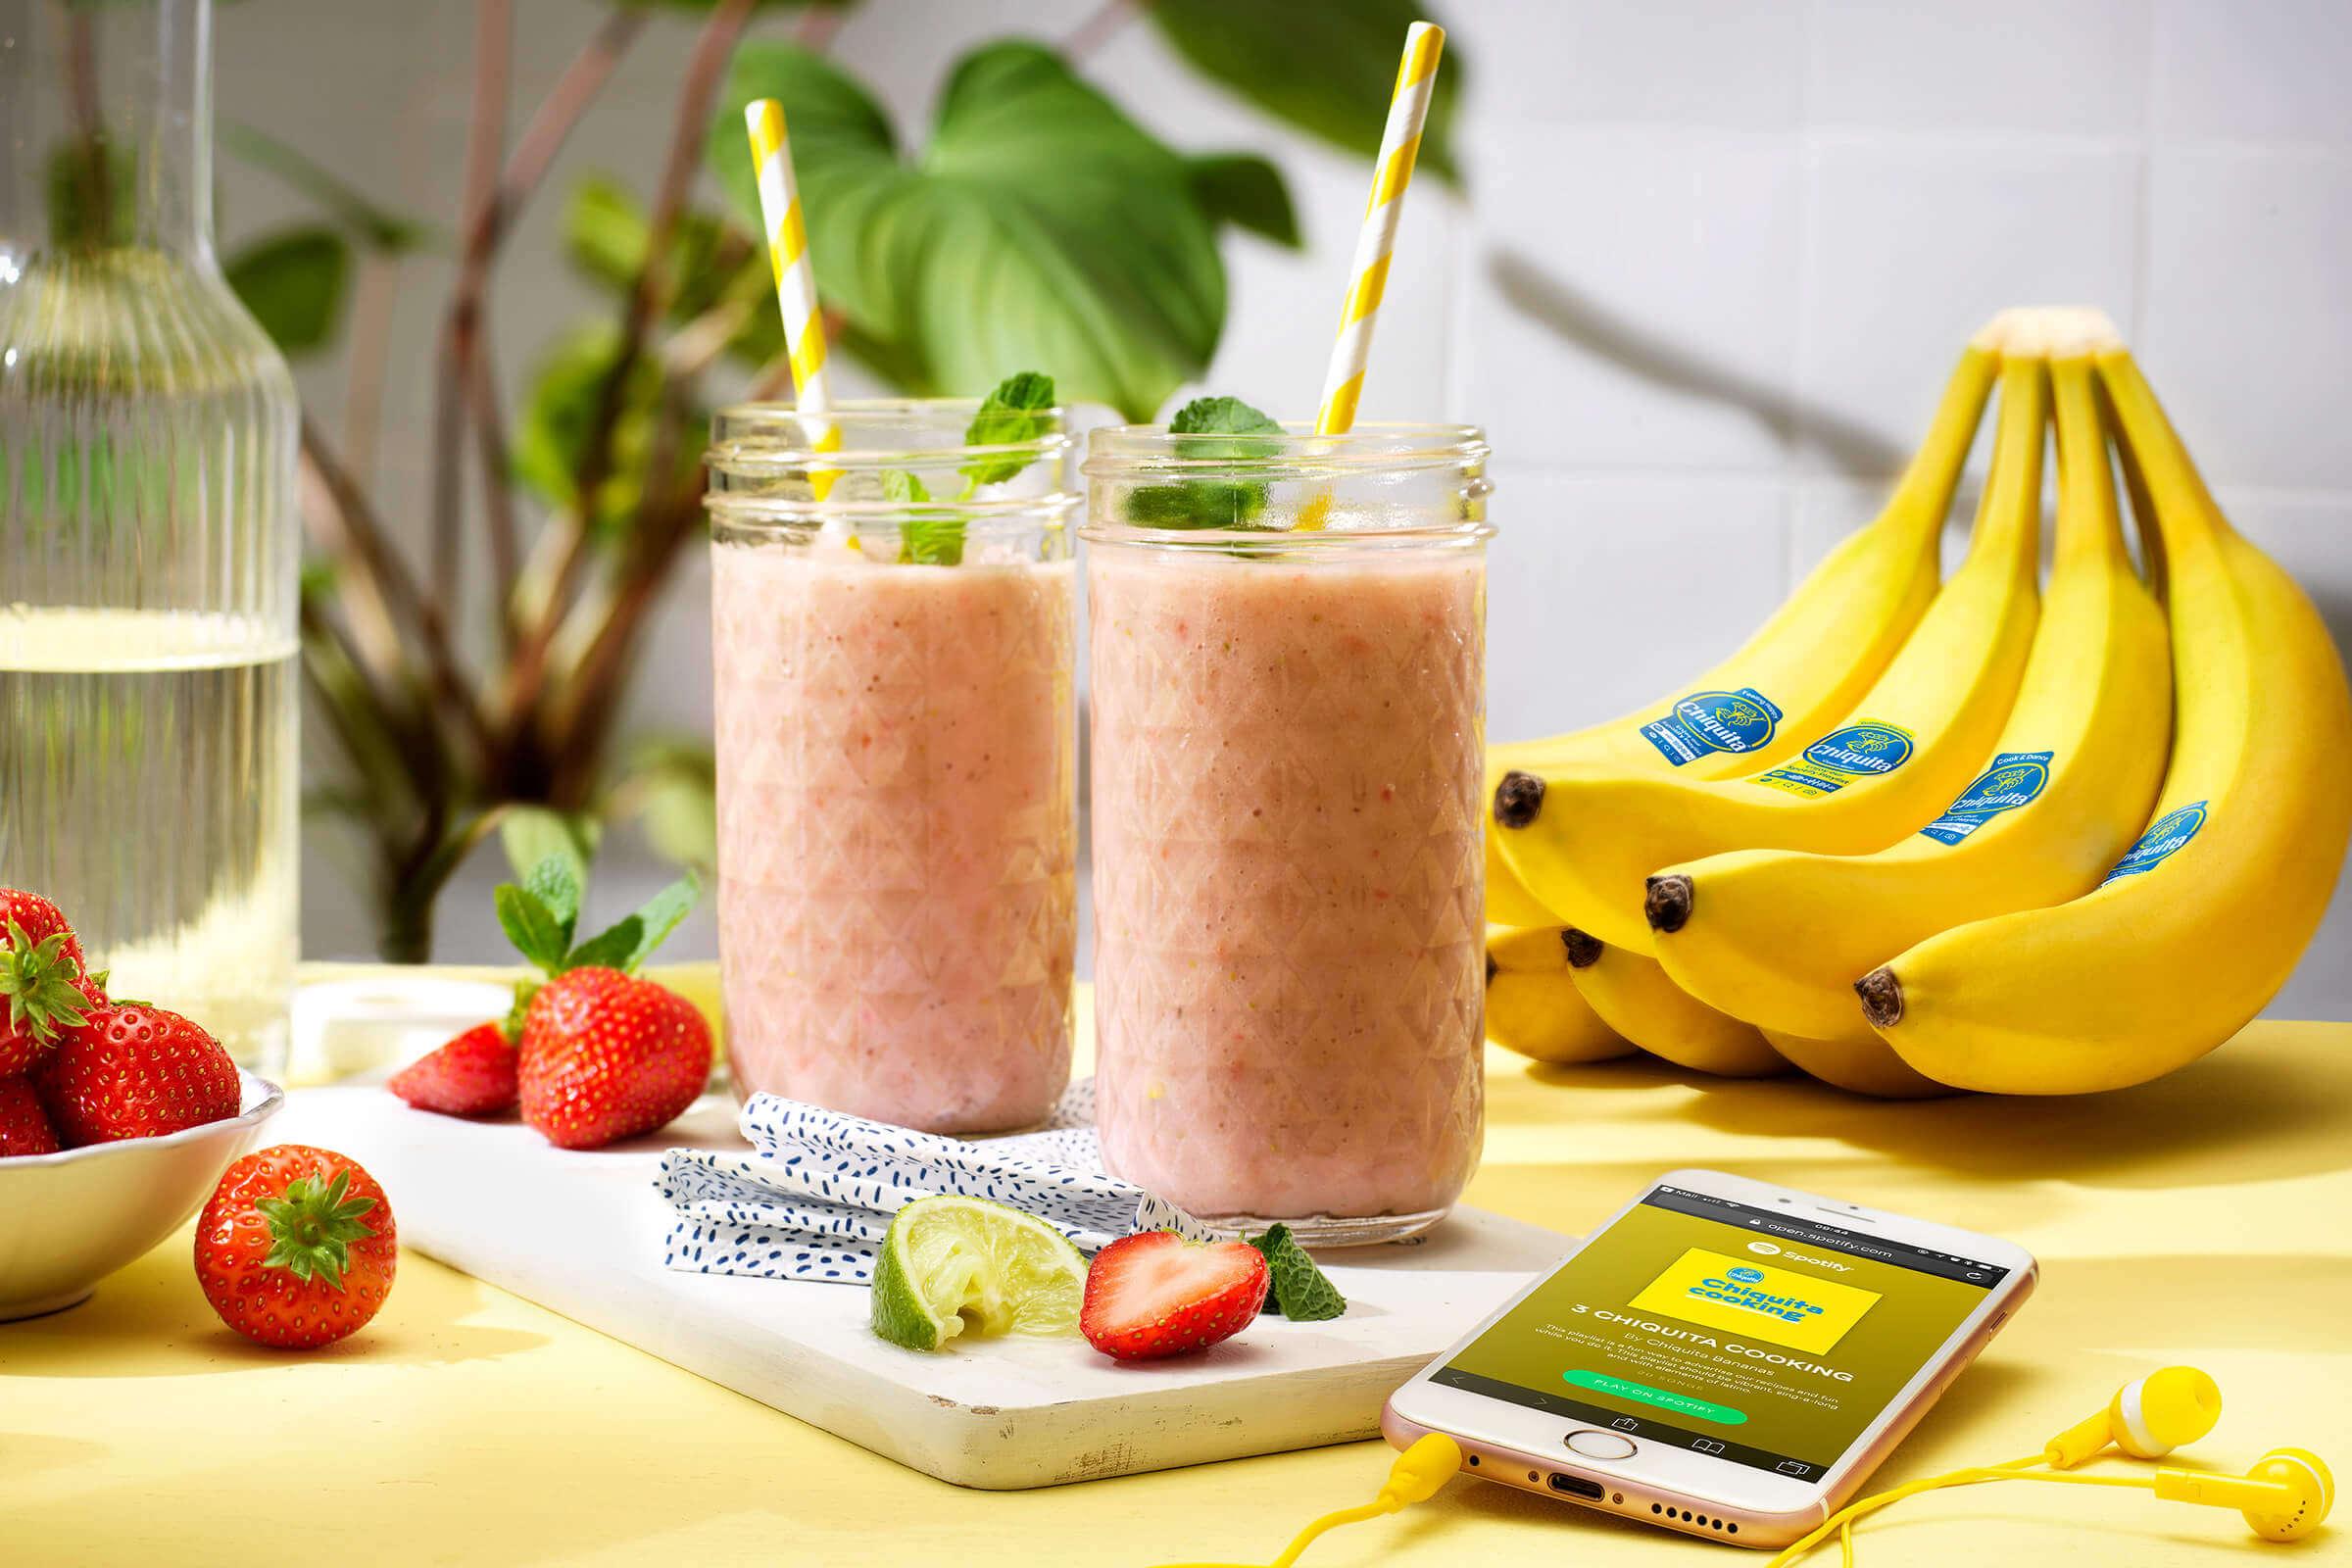 Strawberry Chiquita Smoothie